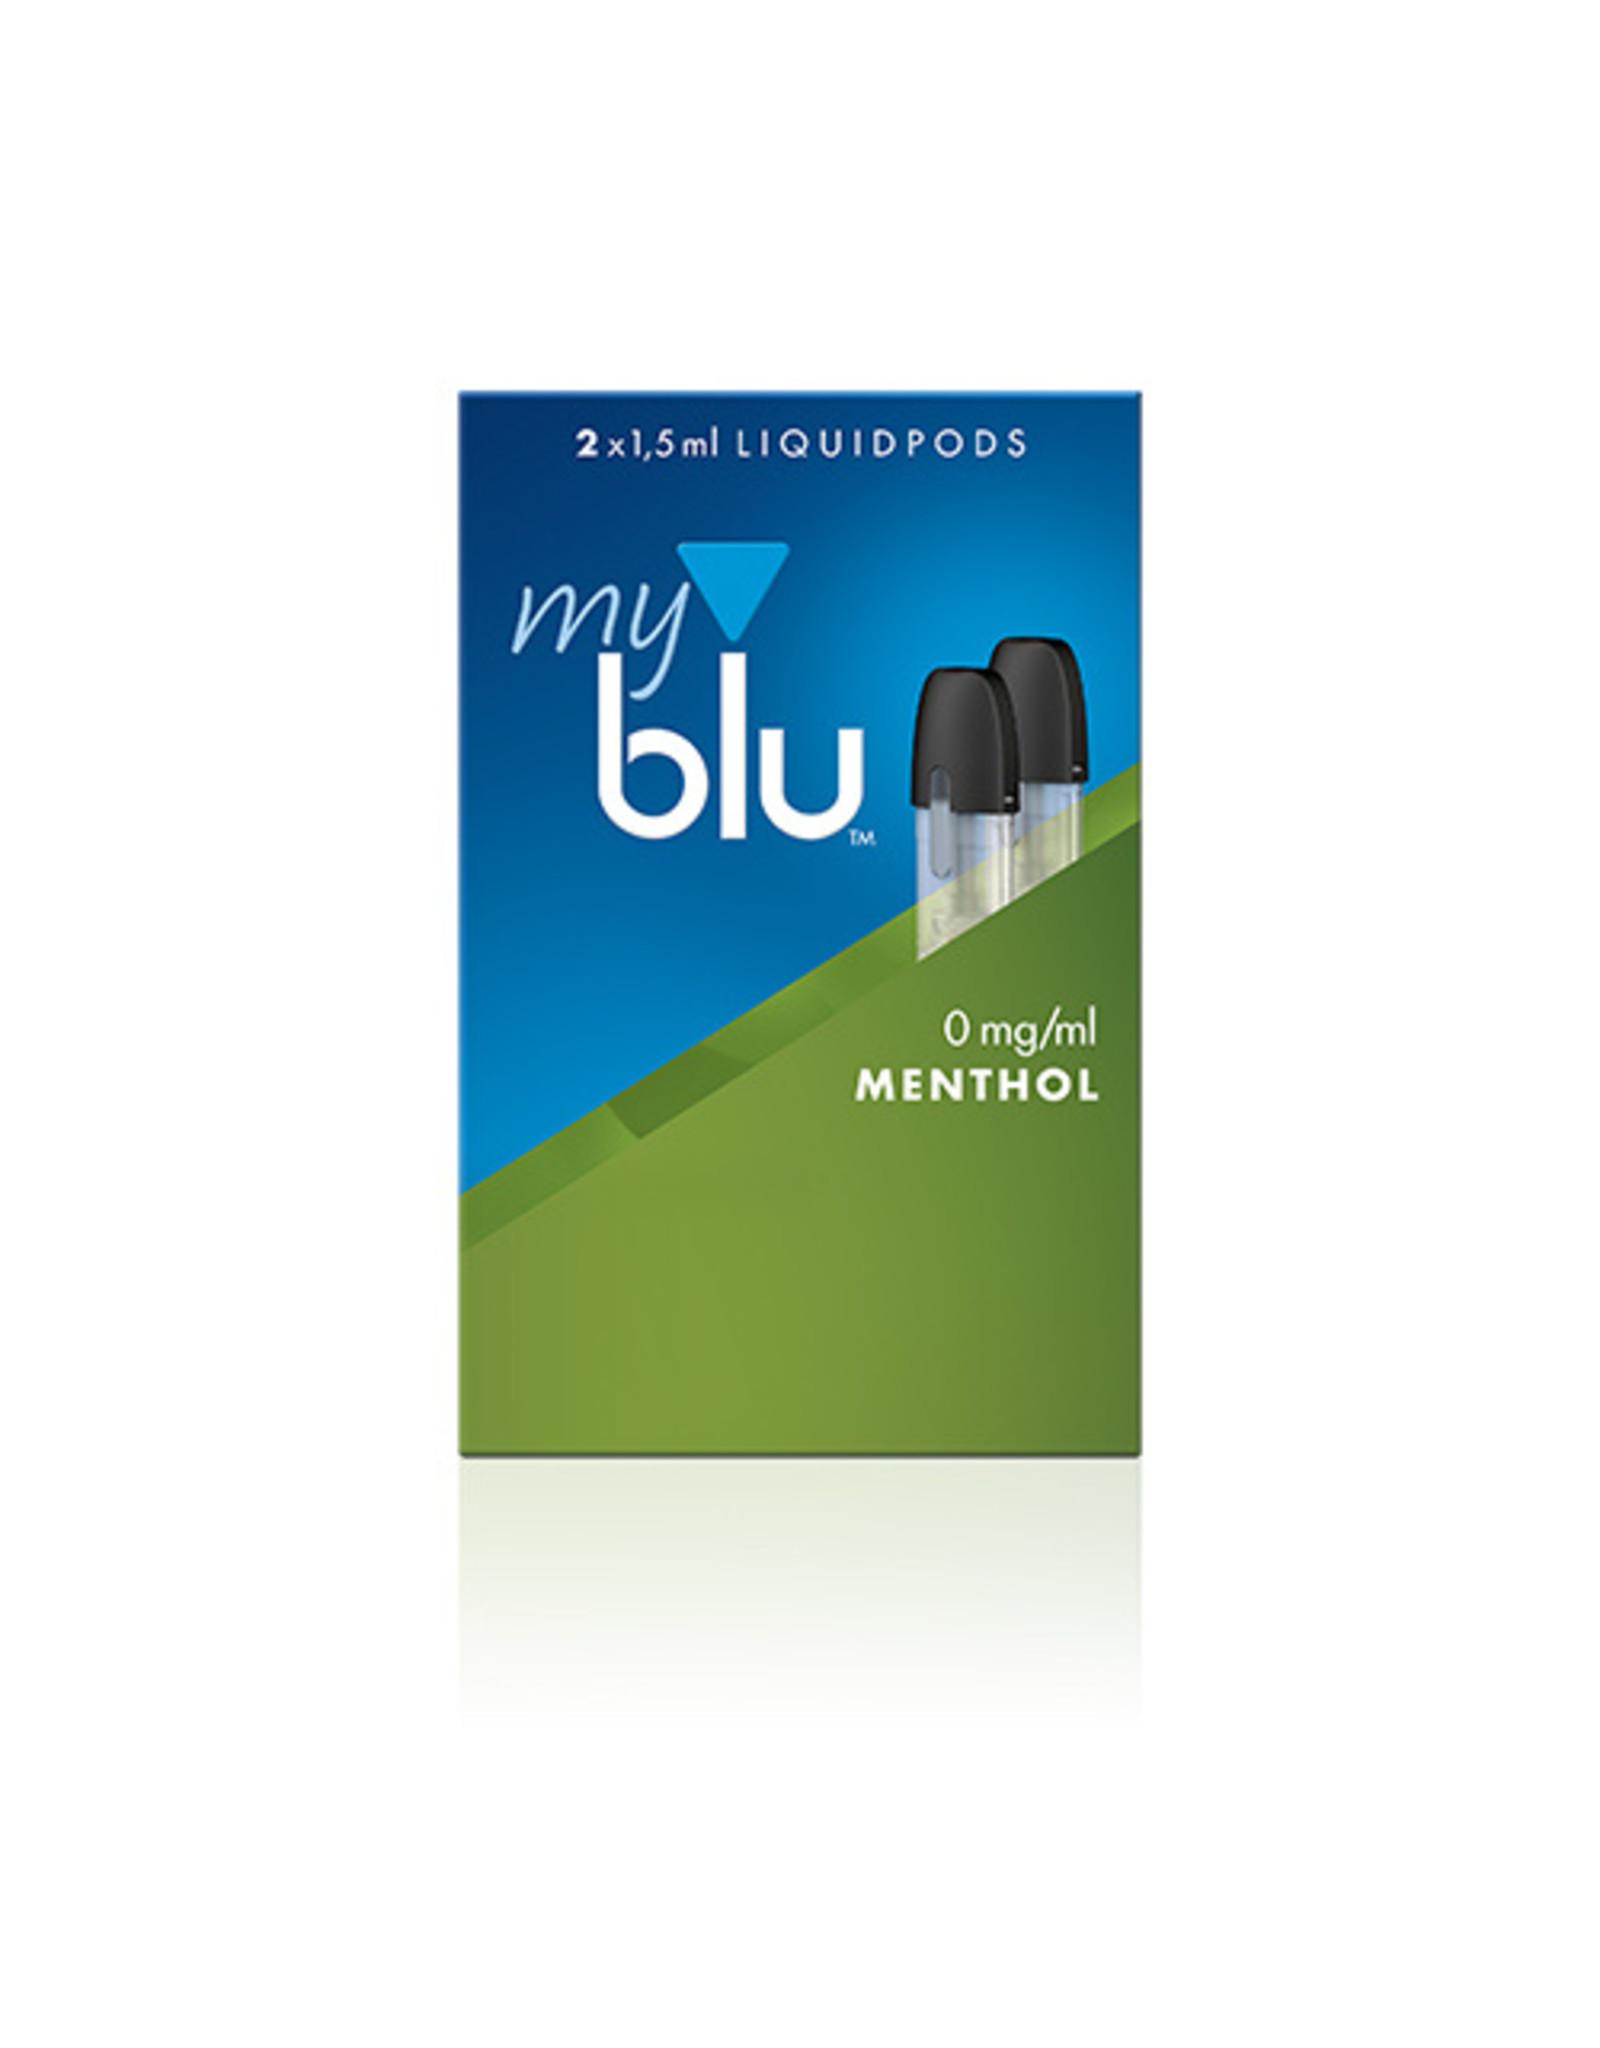 My Blu myblu MENTHOL 0mg/ml LIQUIDPOD